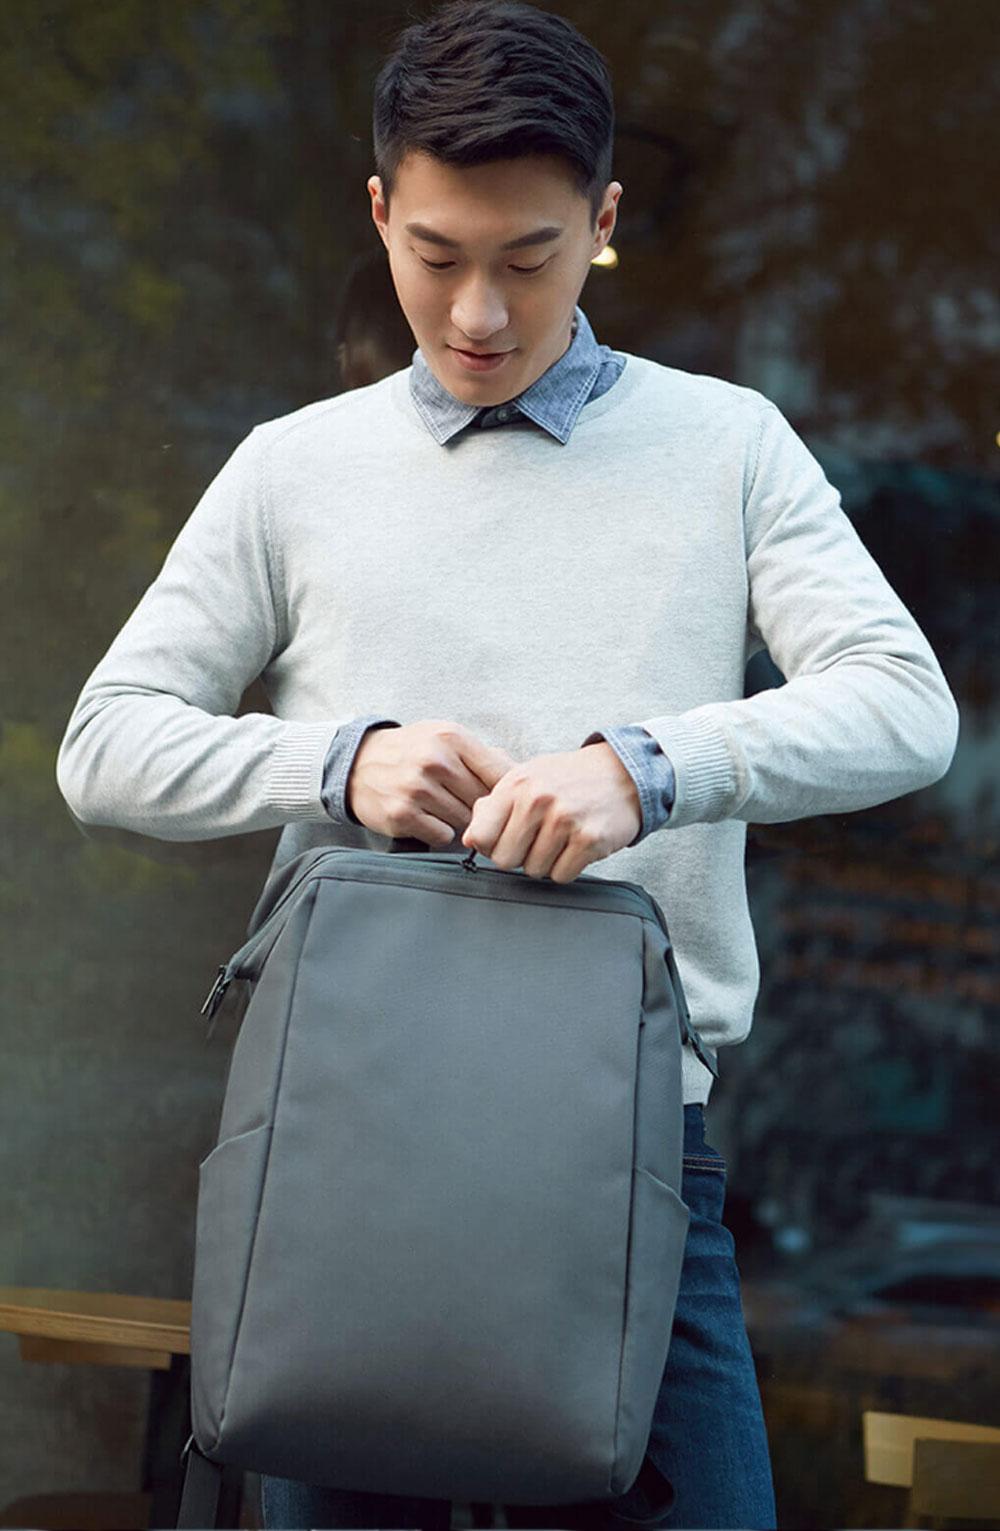 buy 90 fun portable backpack